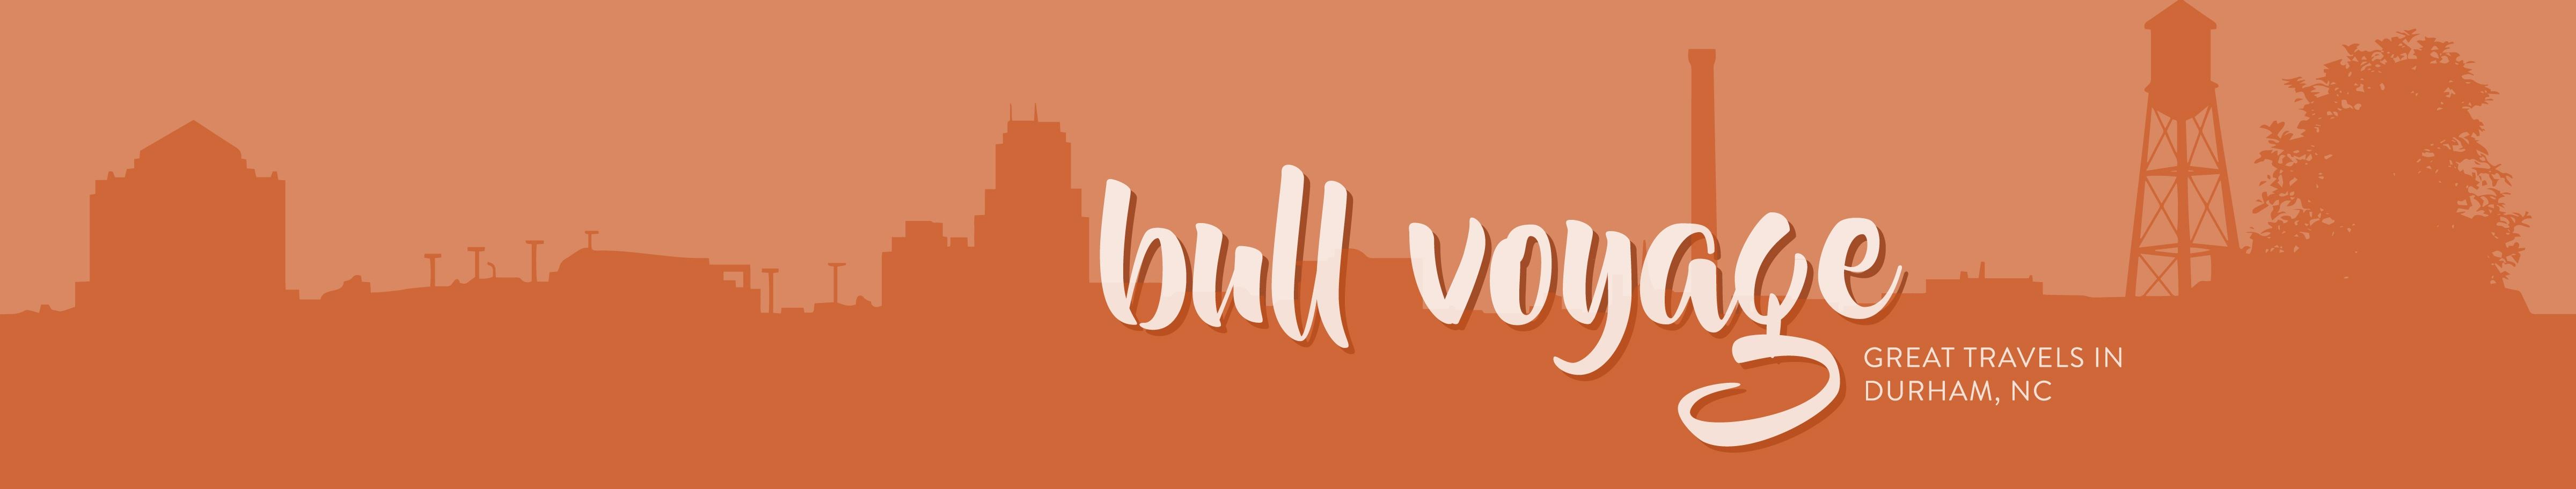 bullvoyage-horizontal-4-1.jpg